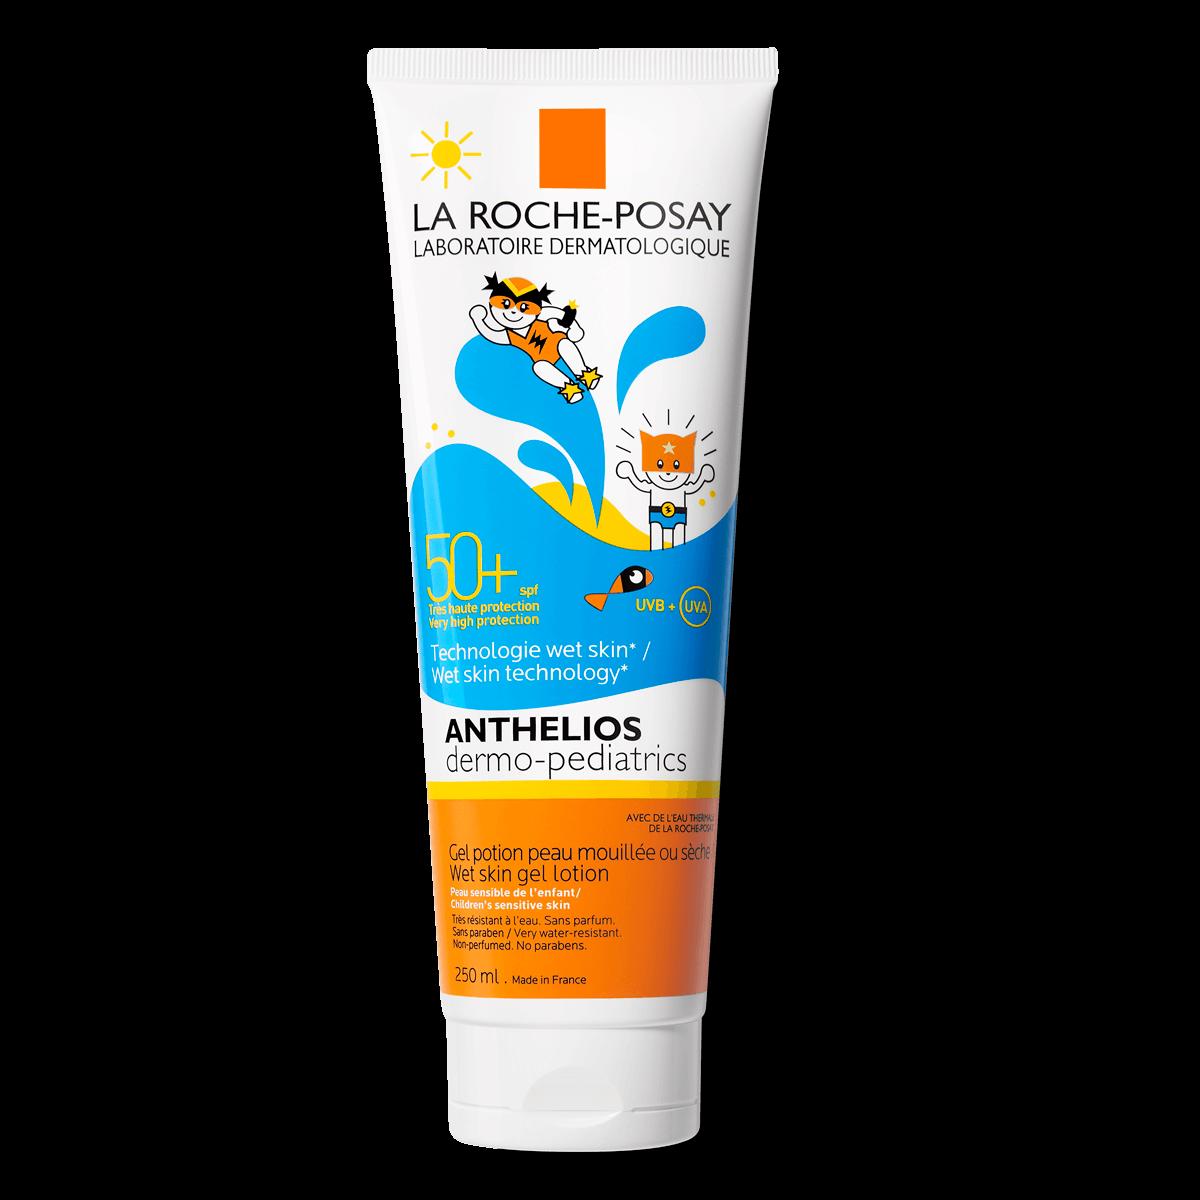 La Roche Posay ProduktSide Sol Anthelios Gel til våd hud Dermo Pædiatri